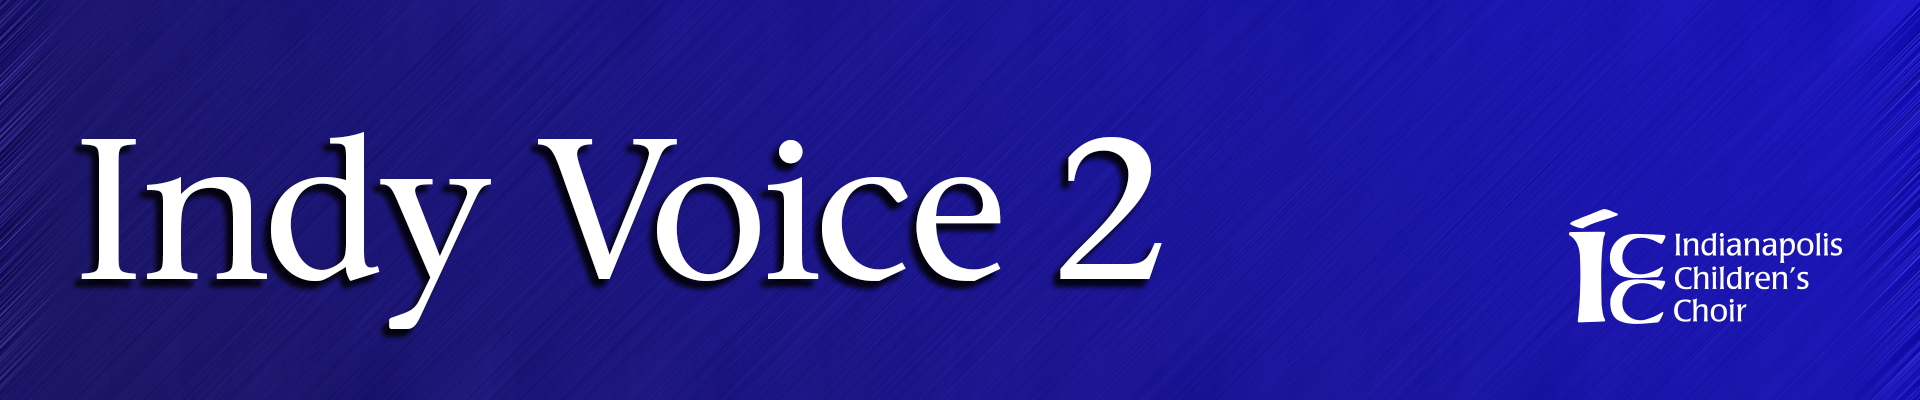 indy voice 2